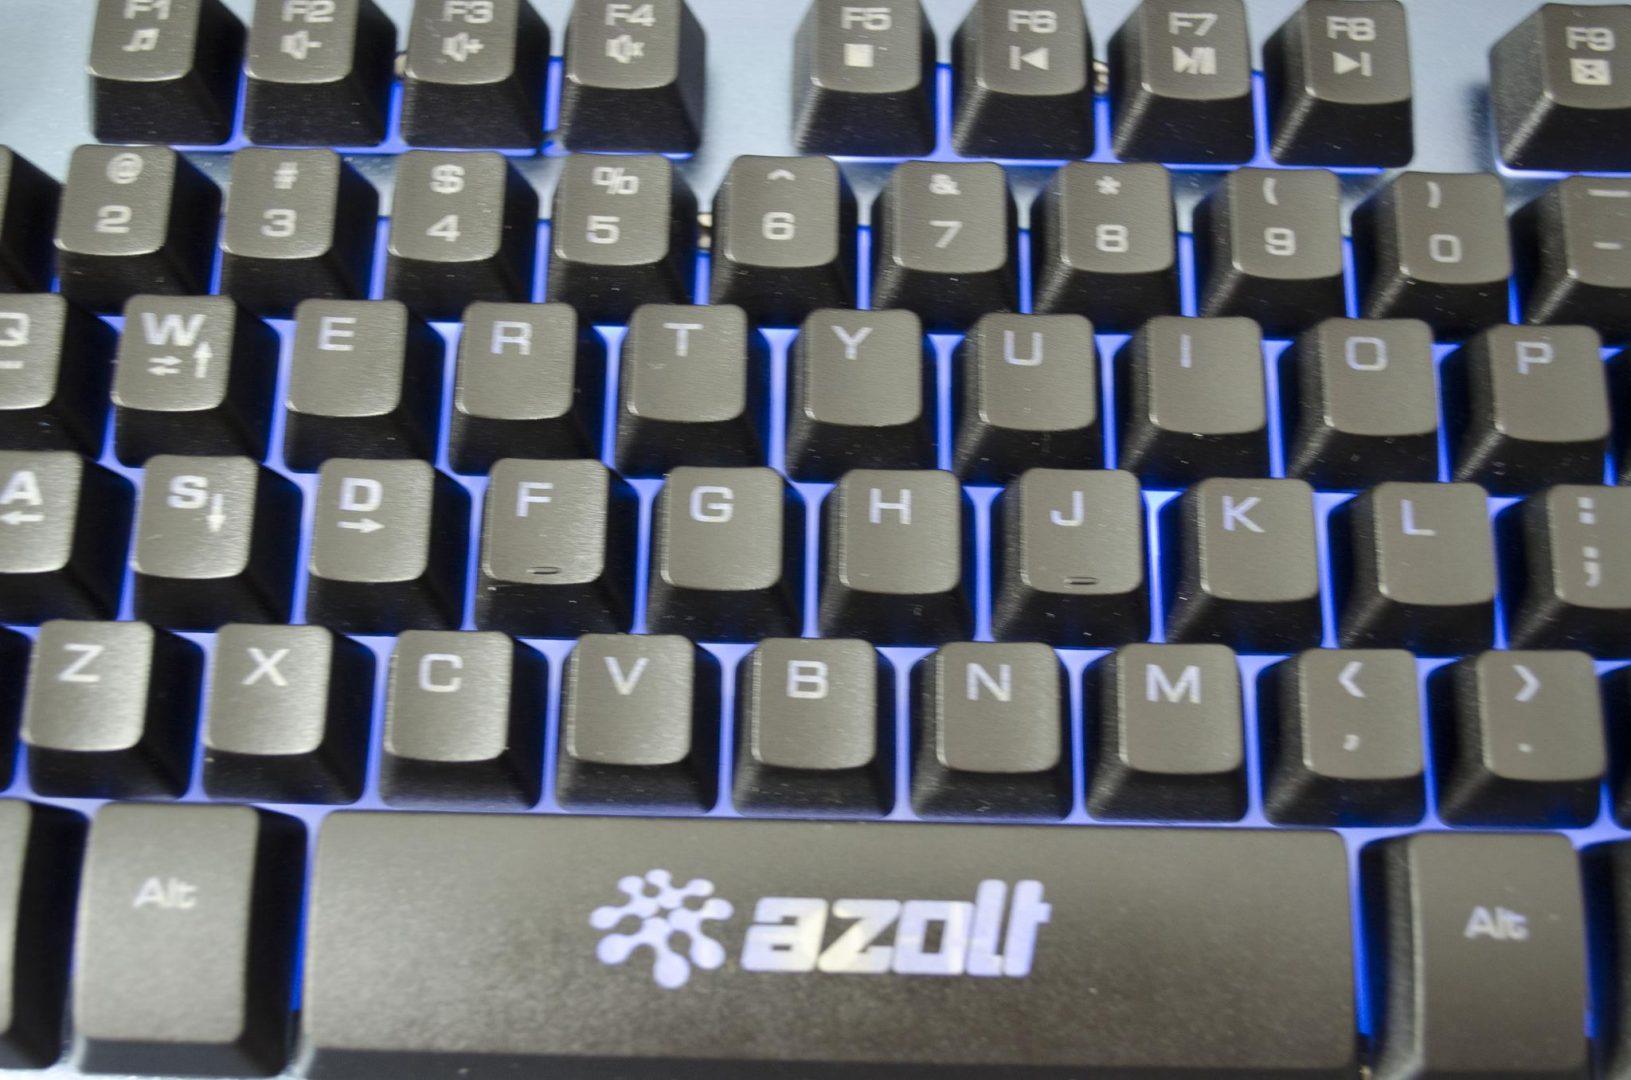 Azolt gCrusayder keyboard review_11